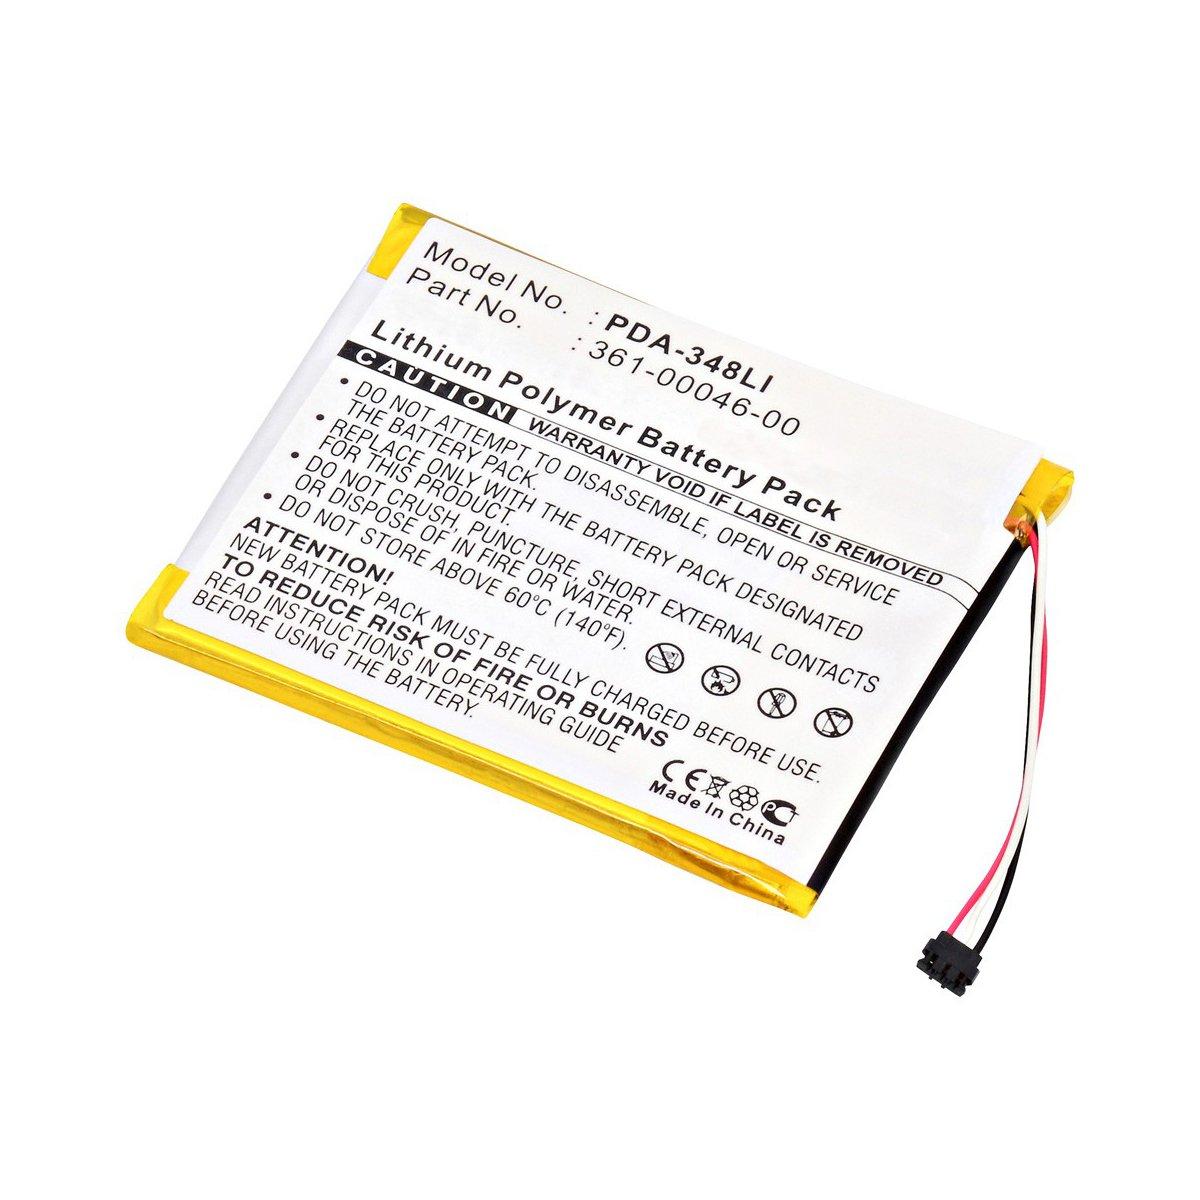 Replacement Garmin Nuvi Gps Battery Batterymart